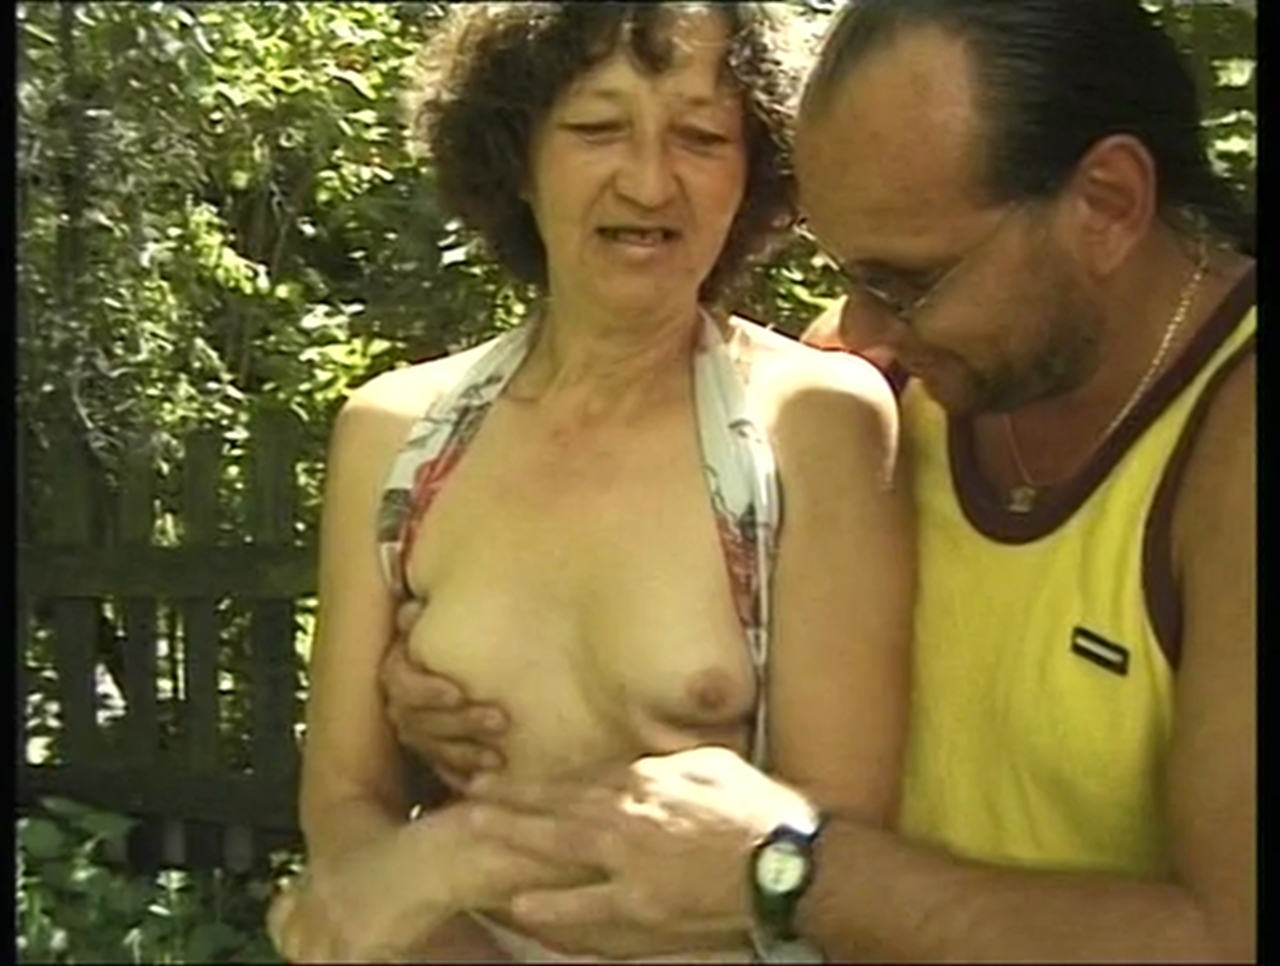 sexkontakte trier tantra sex massage video